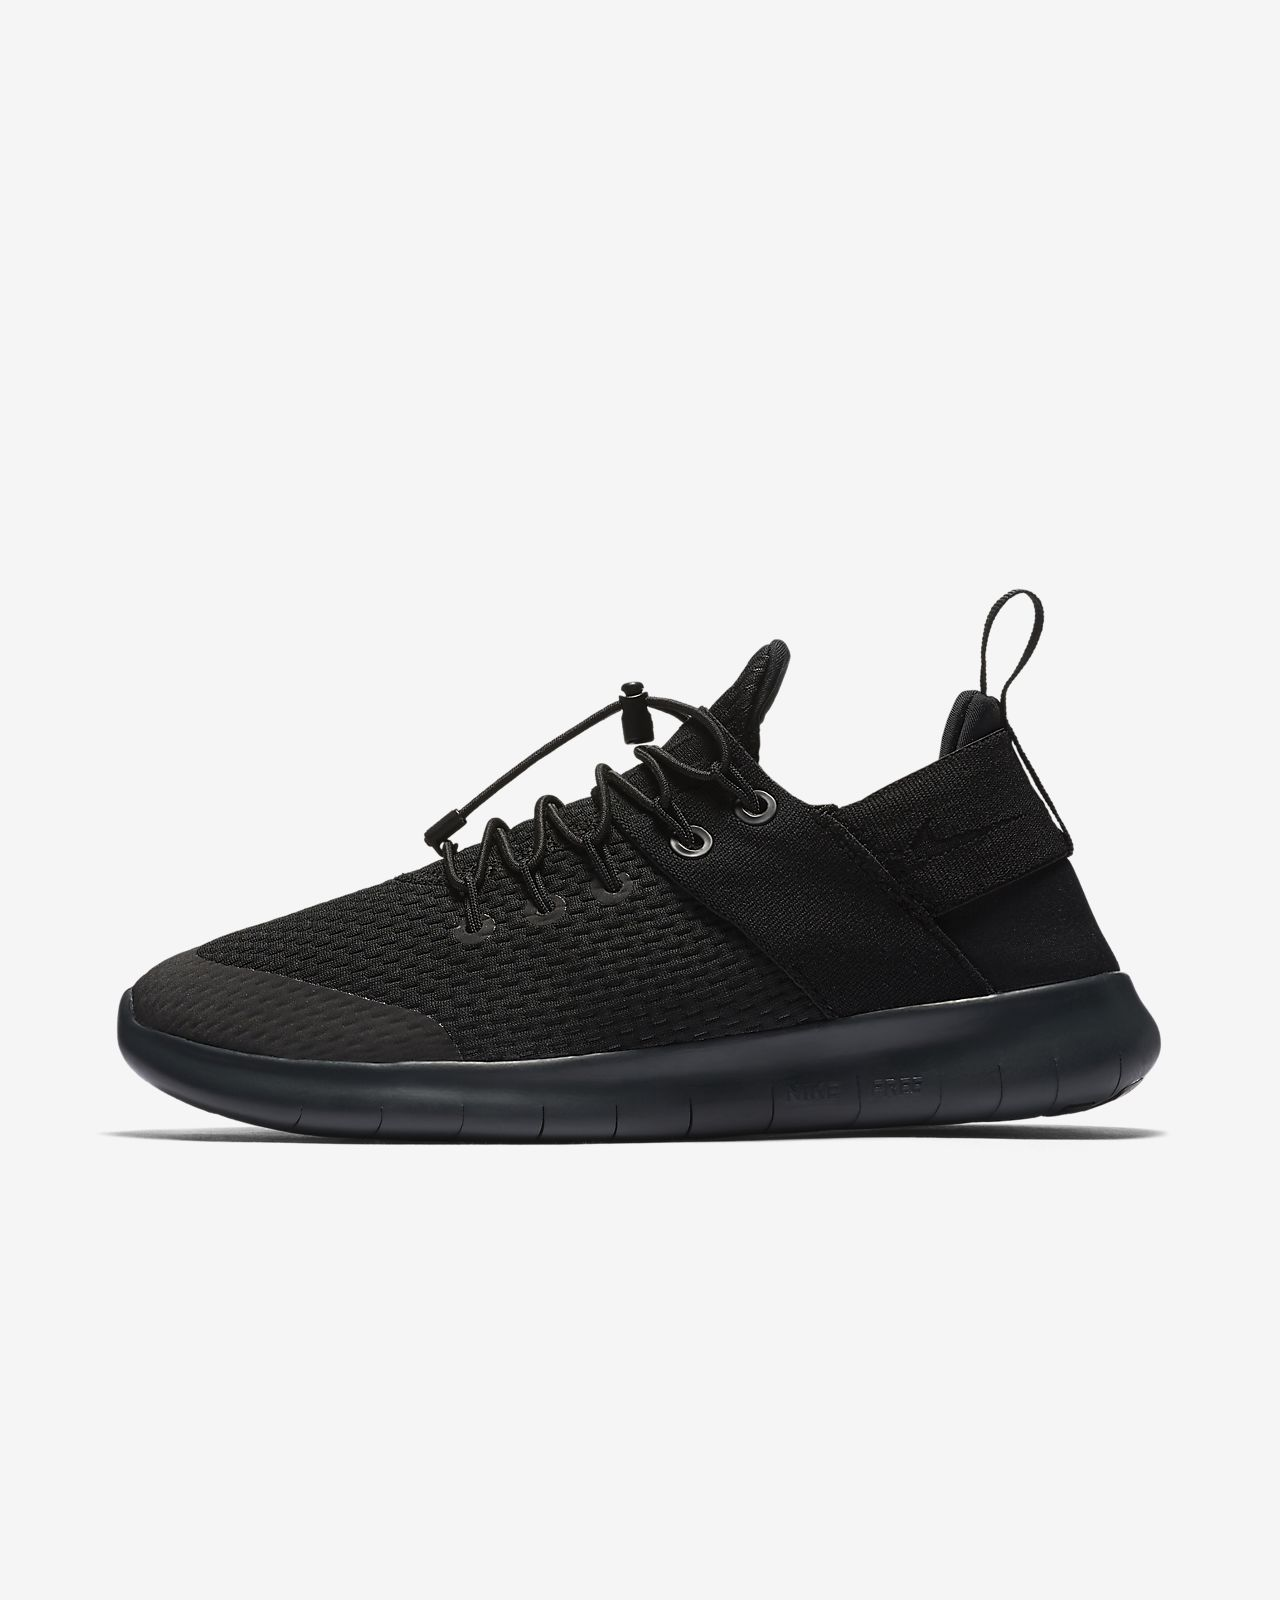 ... Nike Free RN Commuter 2017 Women's Running Shoe